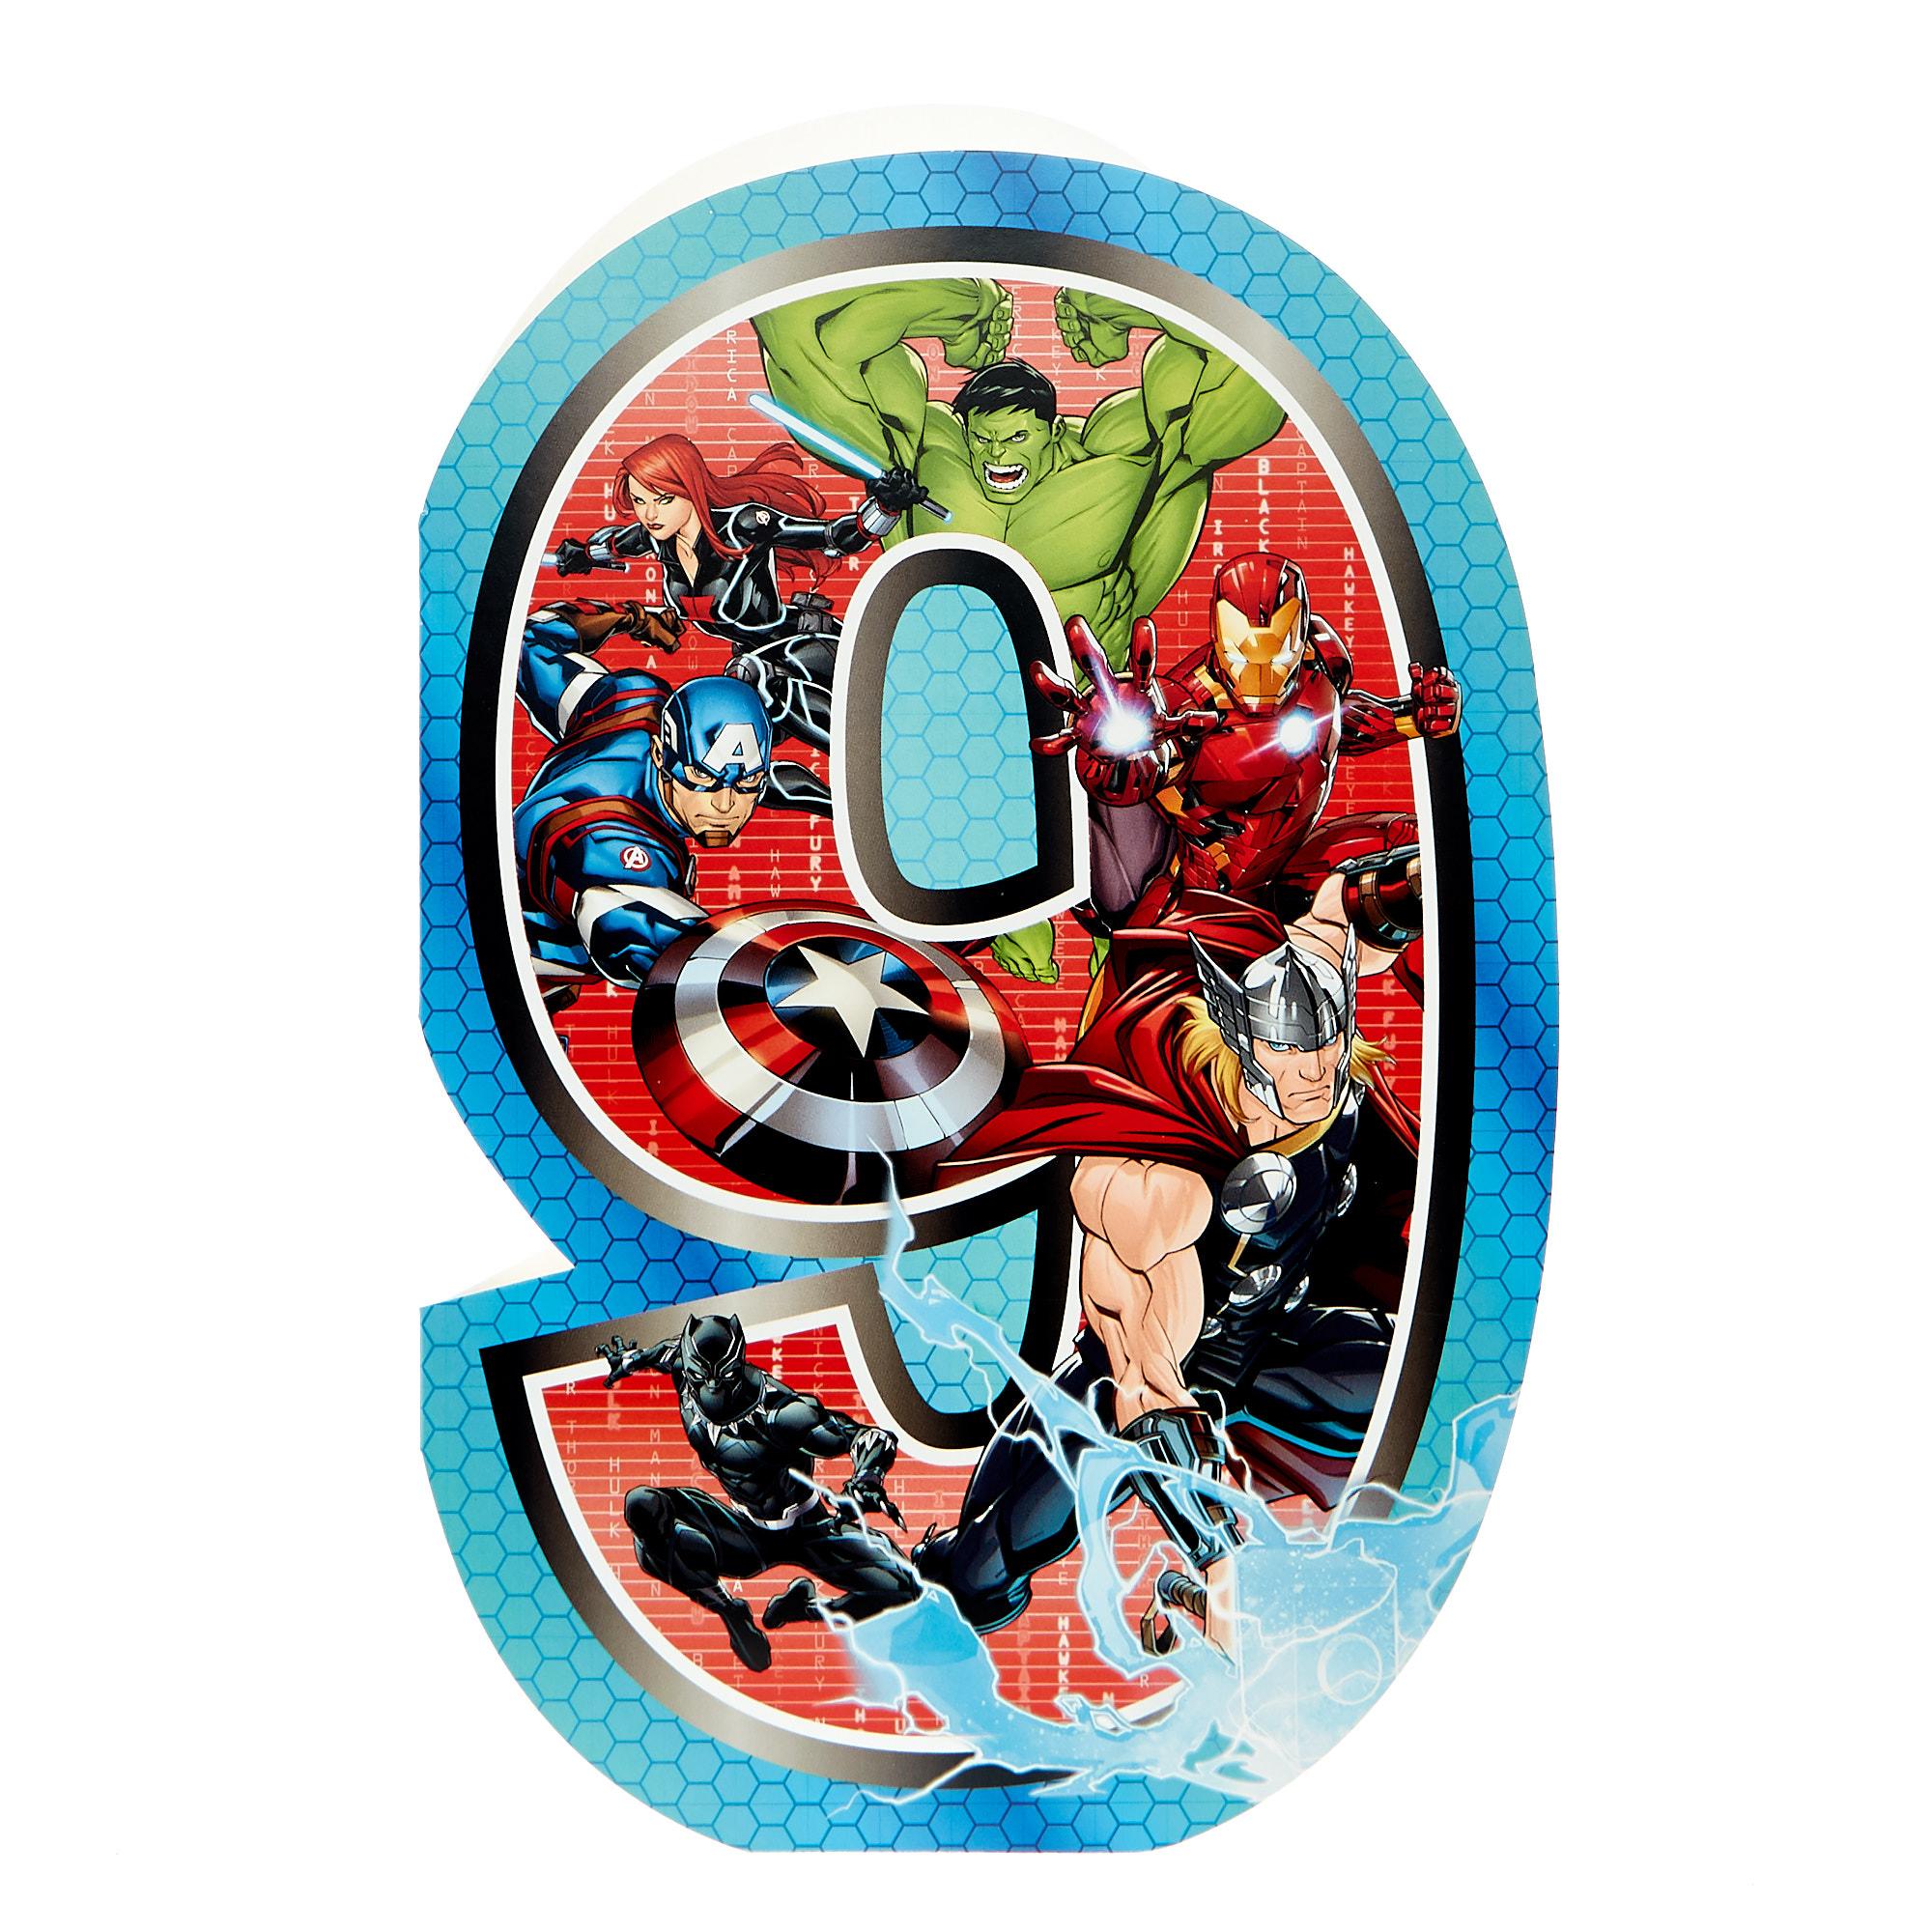 Buy Marvel Avengers 9th Birthday Card for GBP 0.99 | Card ...